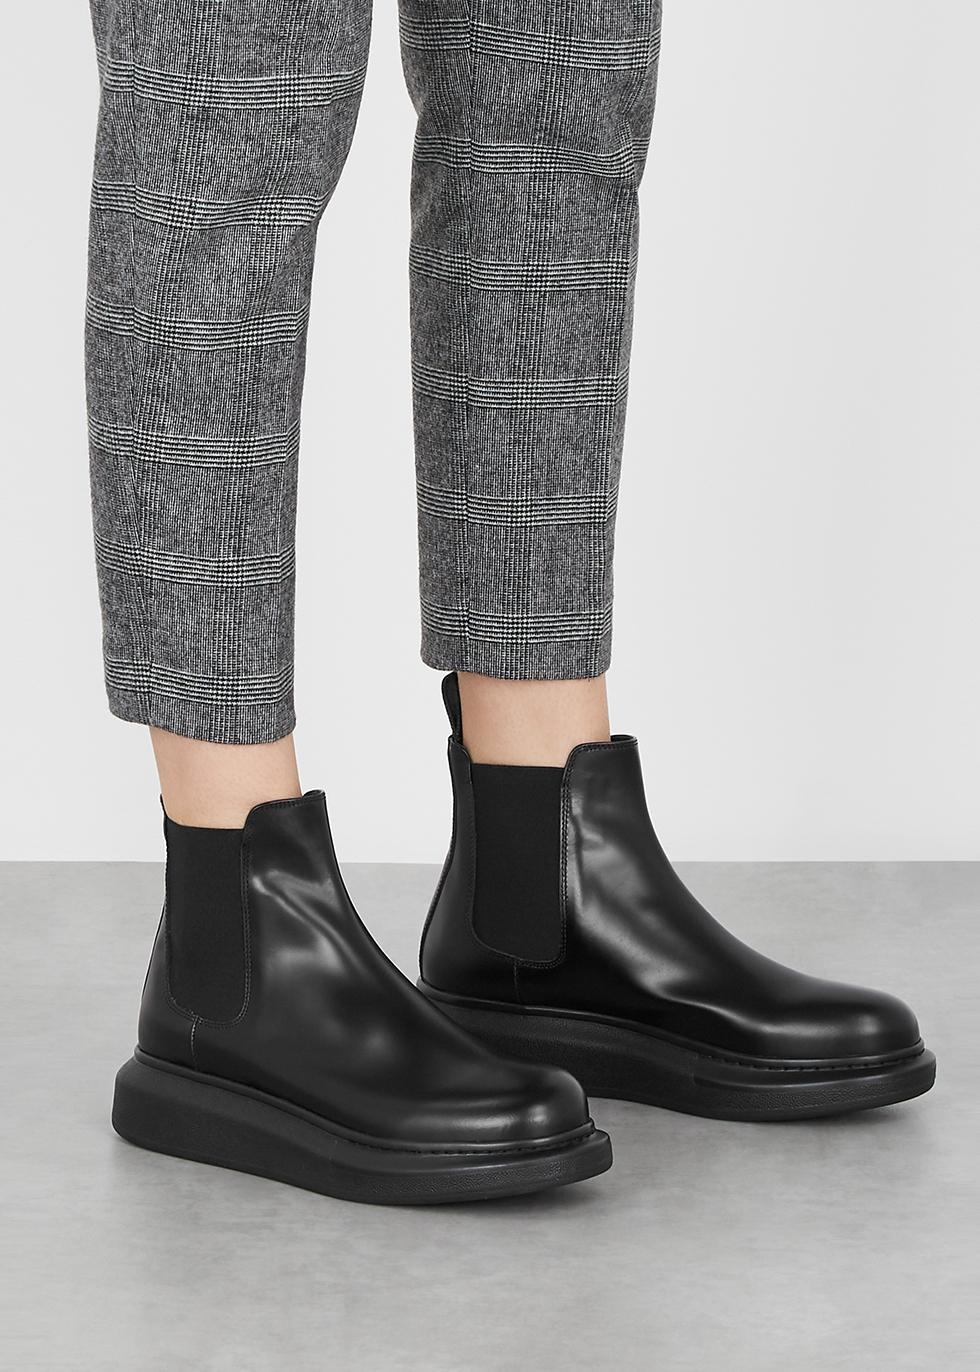 Alexander McQueen Hybrid black leather